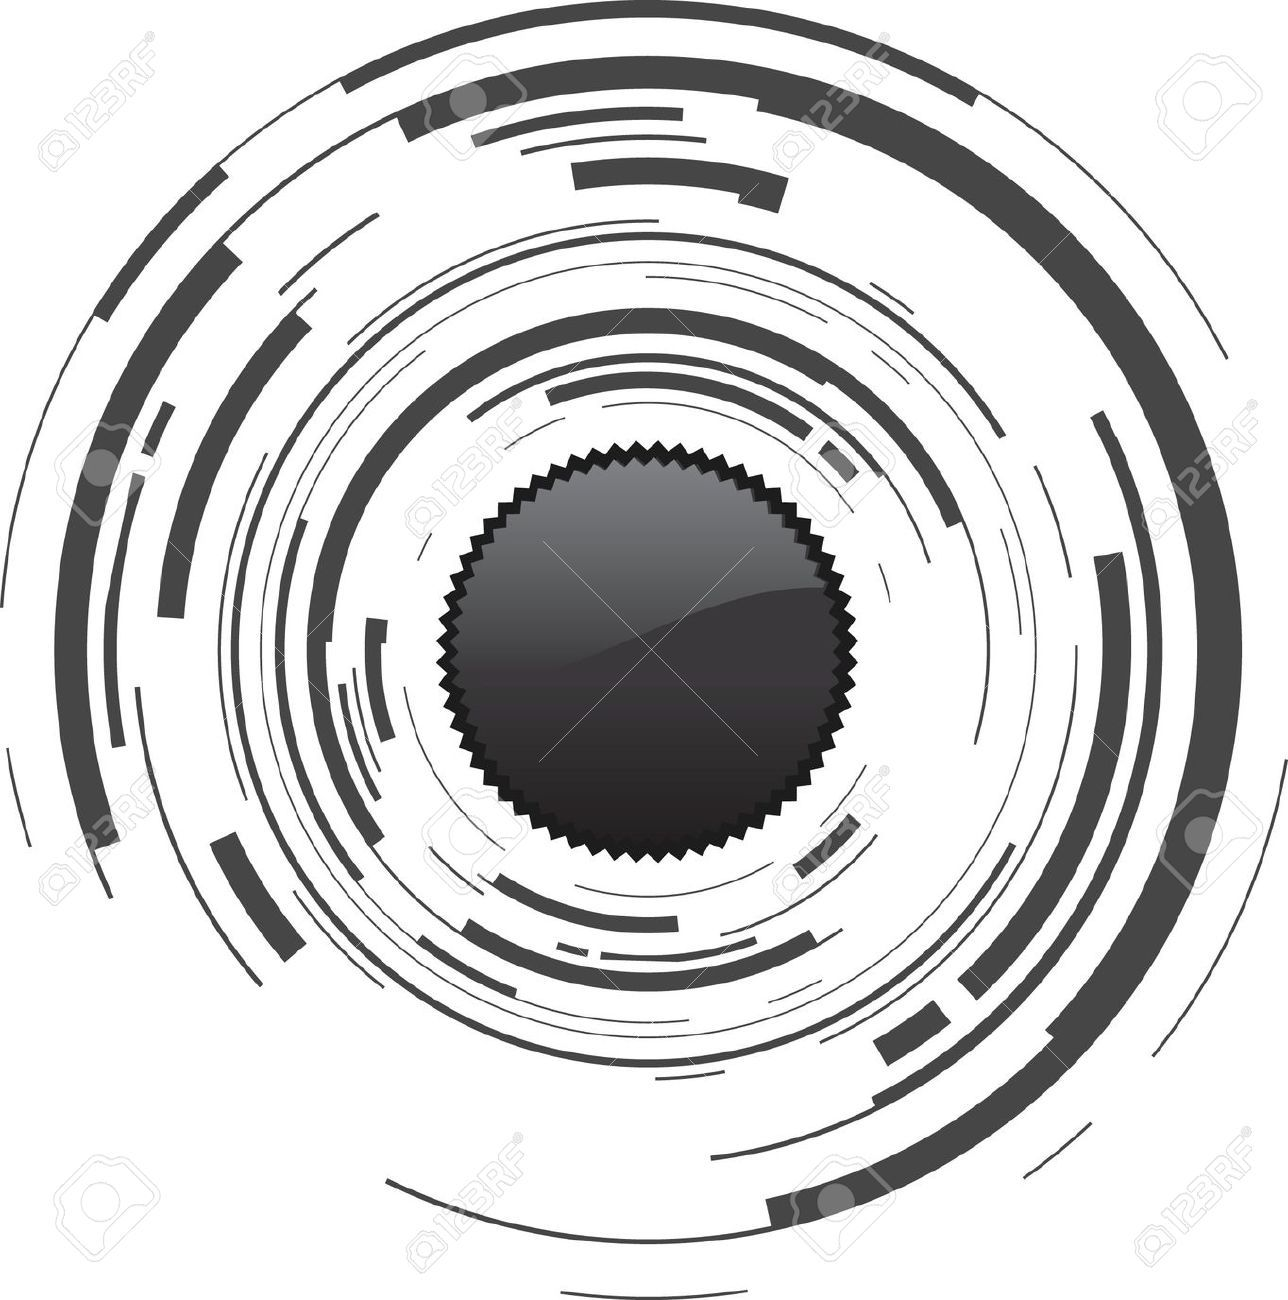 1288x1300 Pics For Gt Camera Focus Vector Khachkar Amp Hye Tattoo Insp Misc